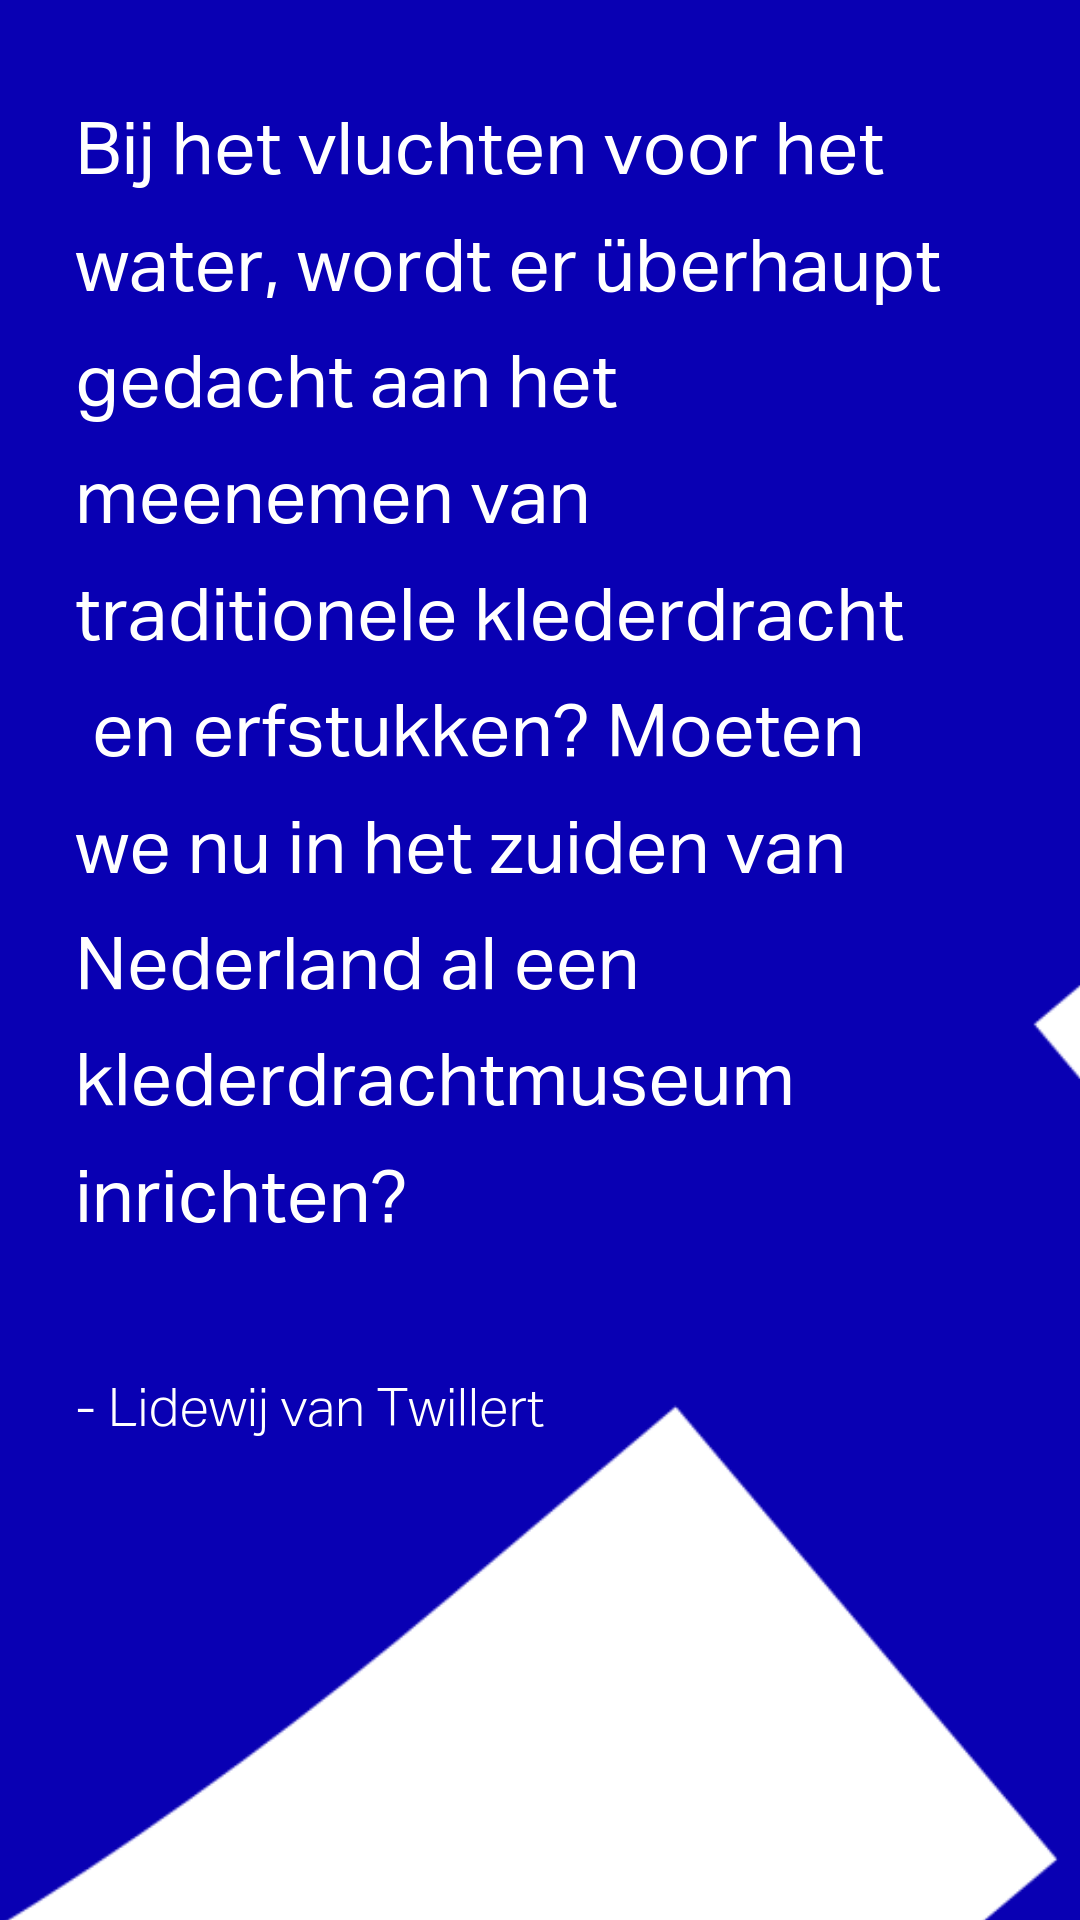 Taskforce-Fashion-Fashion-After-Flood-kennismaking-Lidewij-van-Twillert-3.png